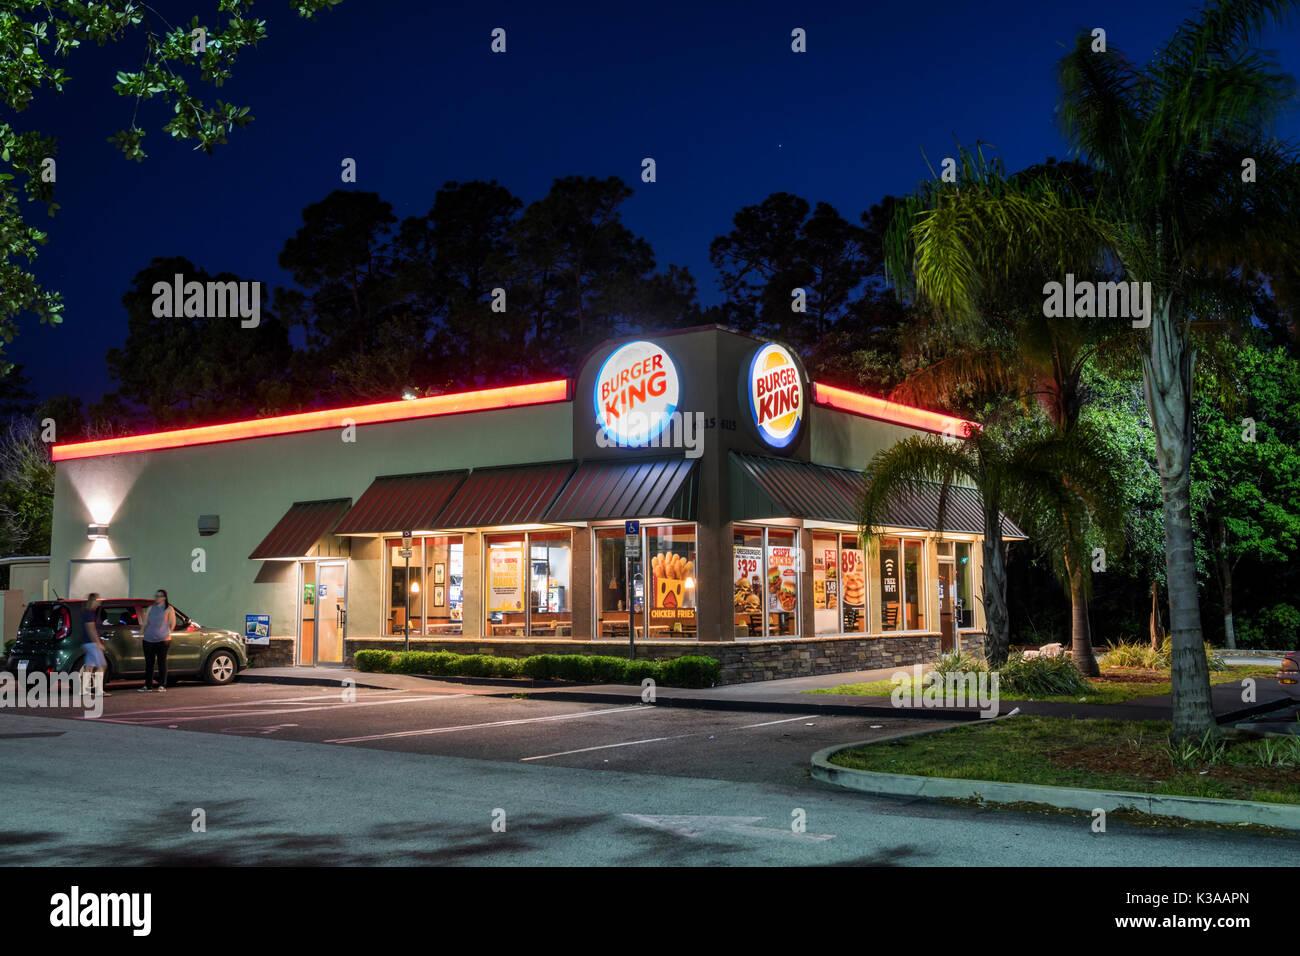 Florida Palm Coast Burger King Restaurant hamburger Kette außerhalb Nachtbeleuchtung Haupteingang fast food Stockfoto